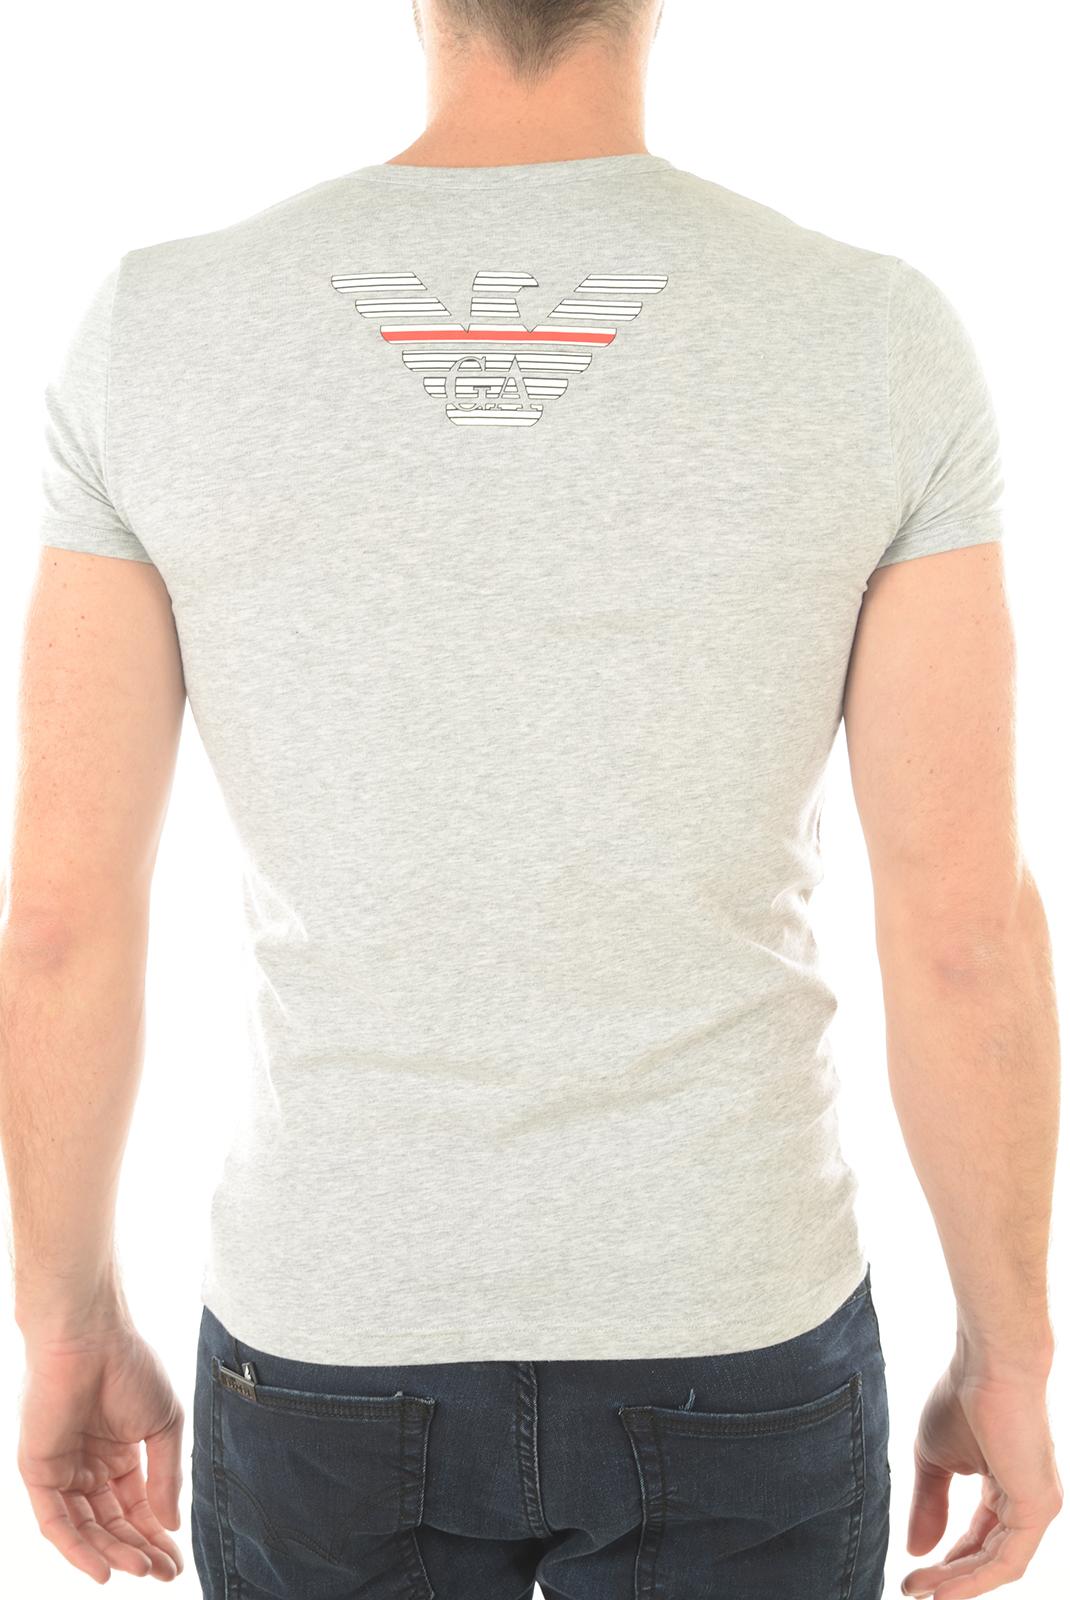 Tee-shirts manches courtes  Emporio armani 110810 6P725 48